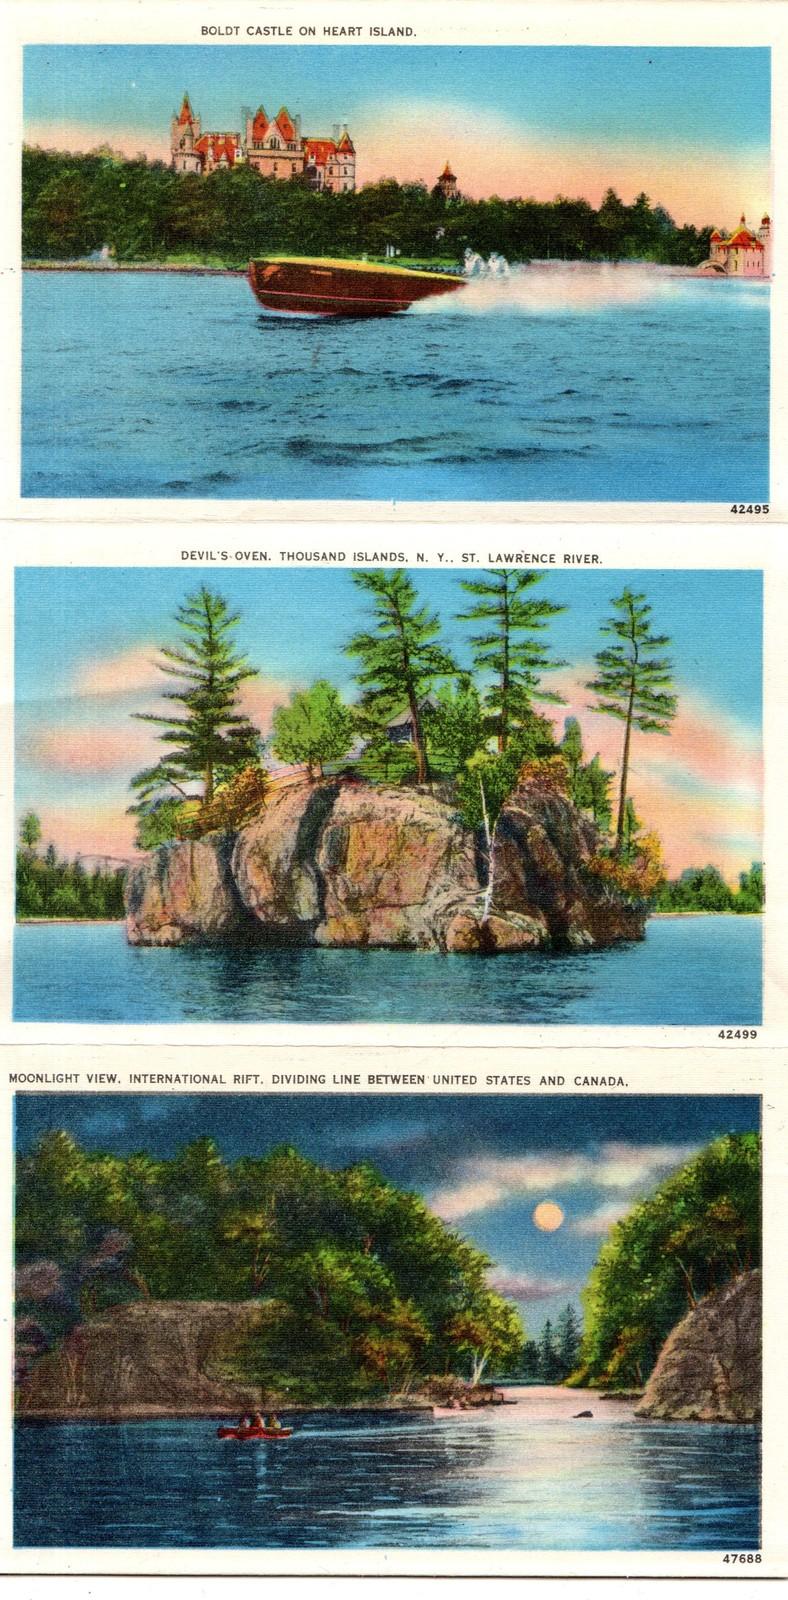 Thousand Islands Venice Of America Book & Souvenir Photo Booklet image 15